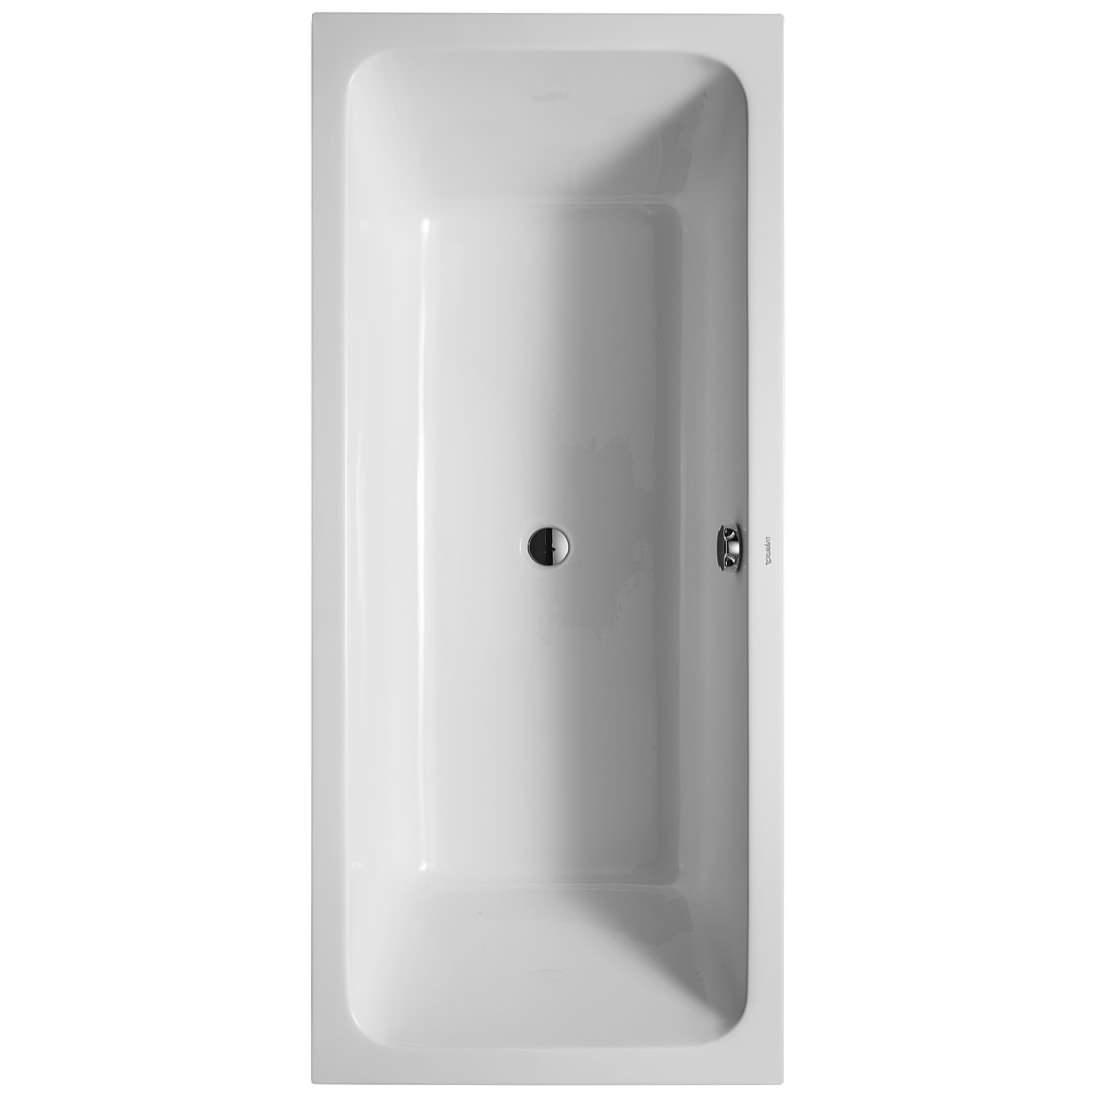 duravit d code 1800 x 800mm bath with support frame. Black Bedroom Furniture Sets. Home Design Ideas